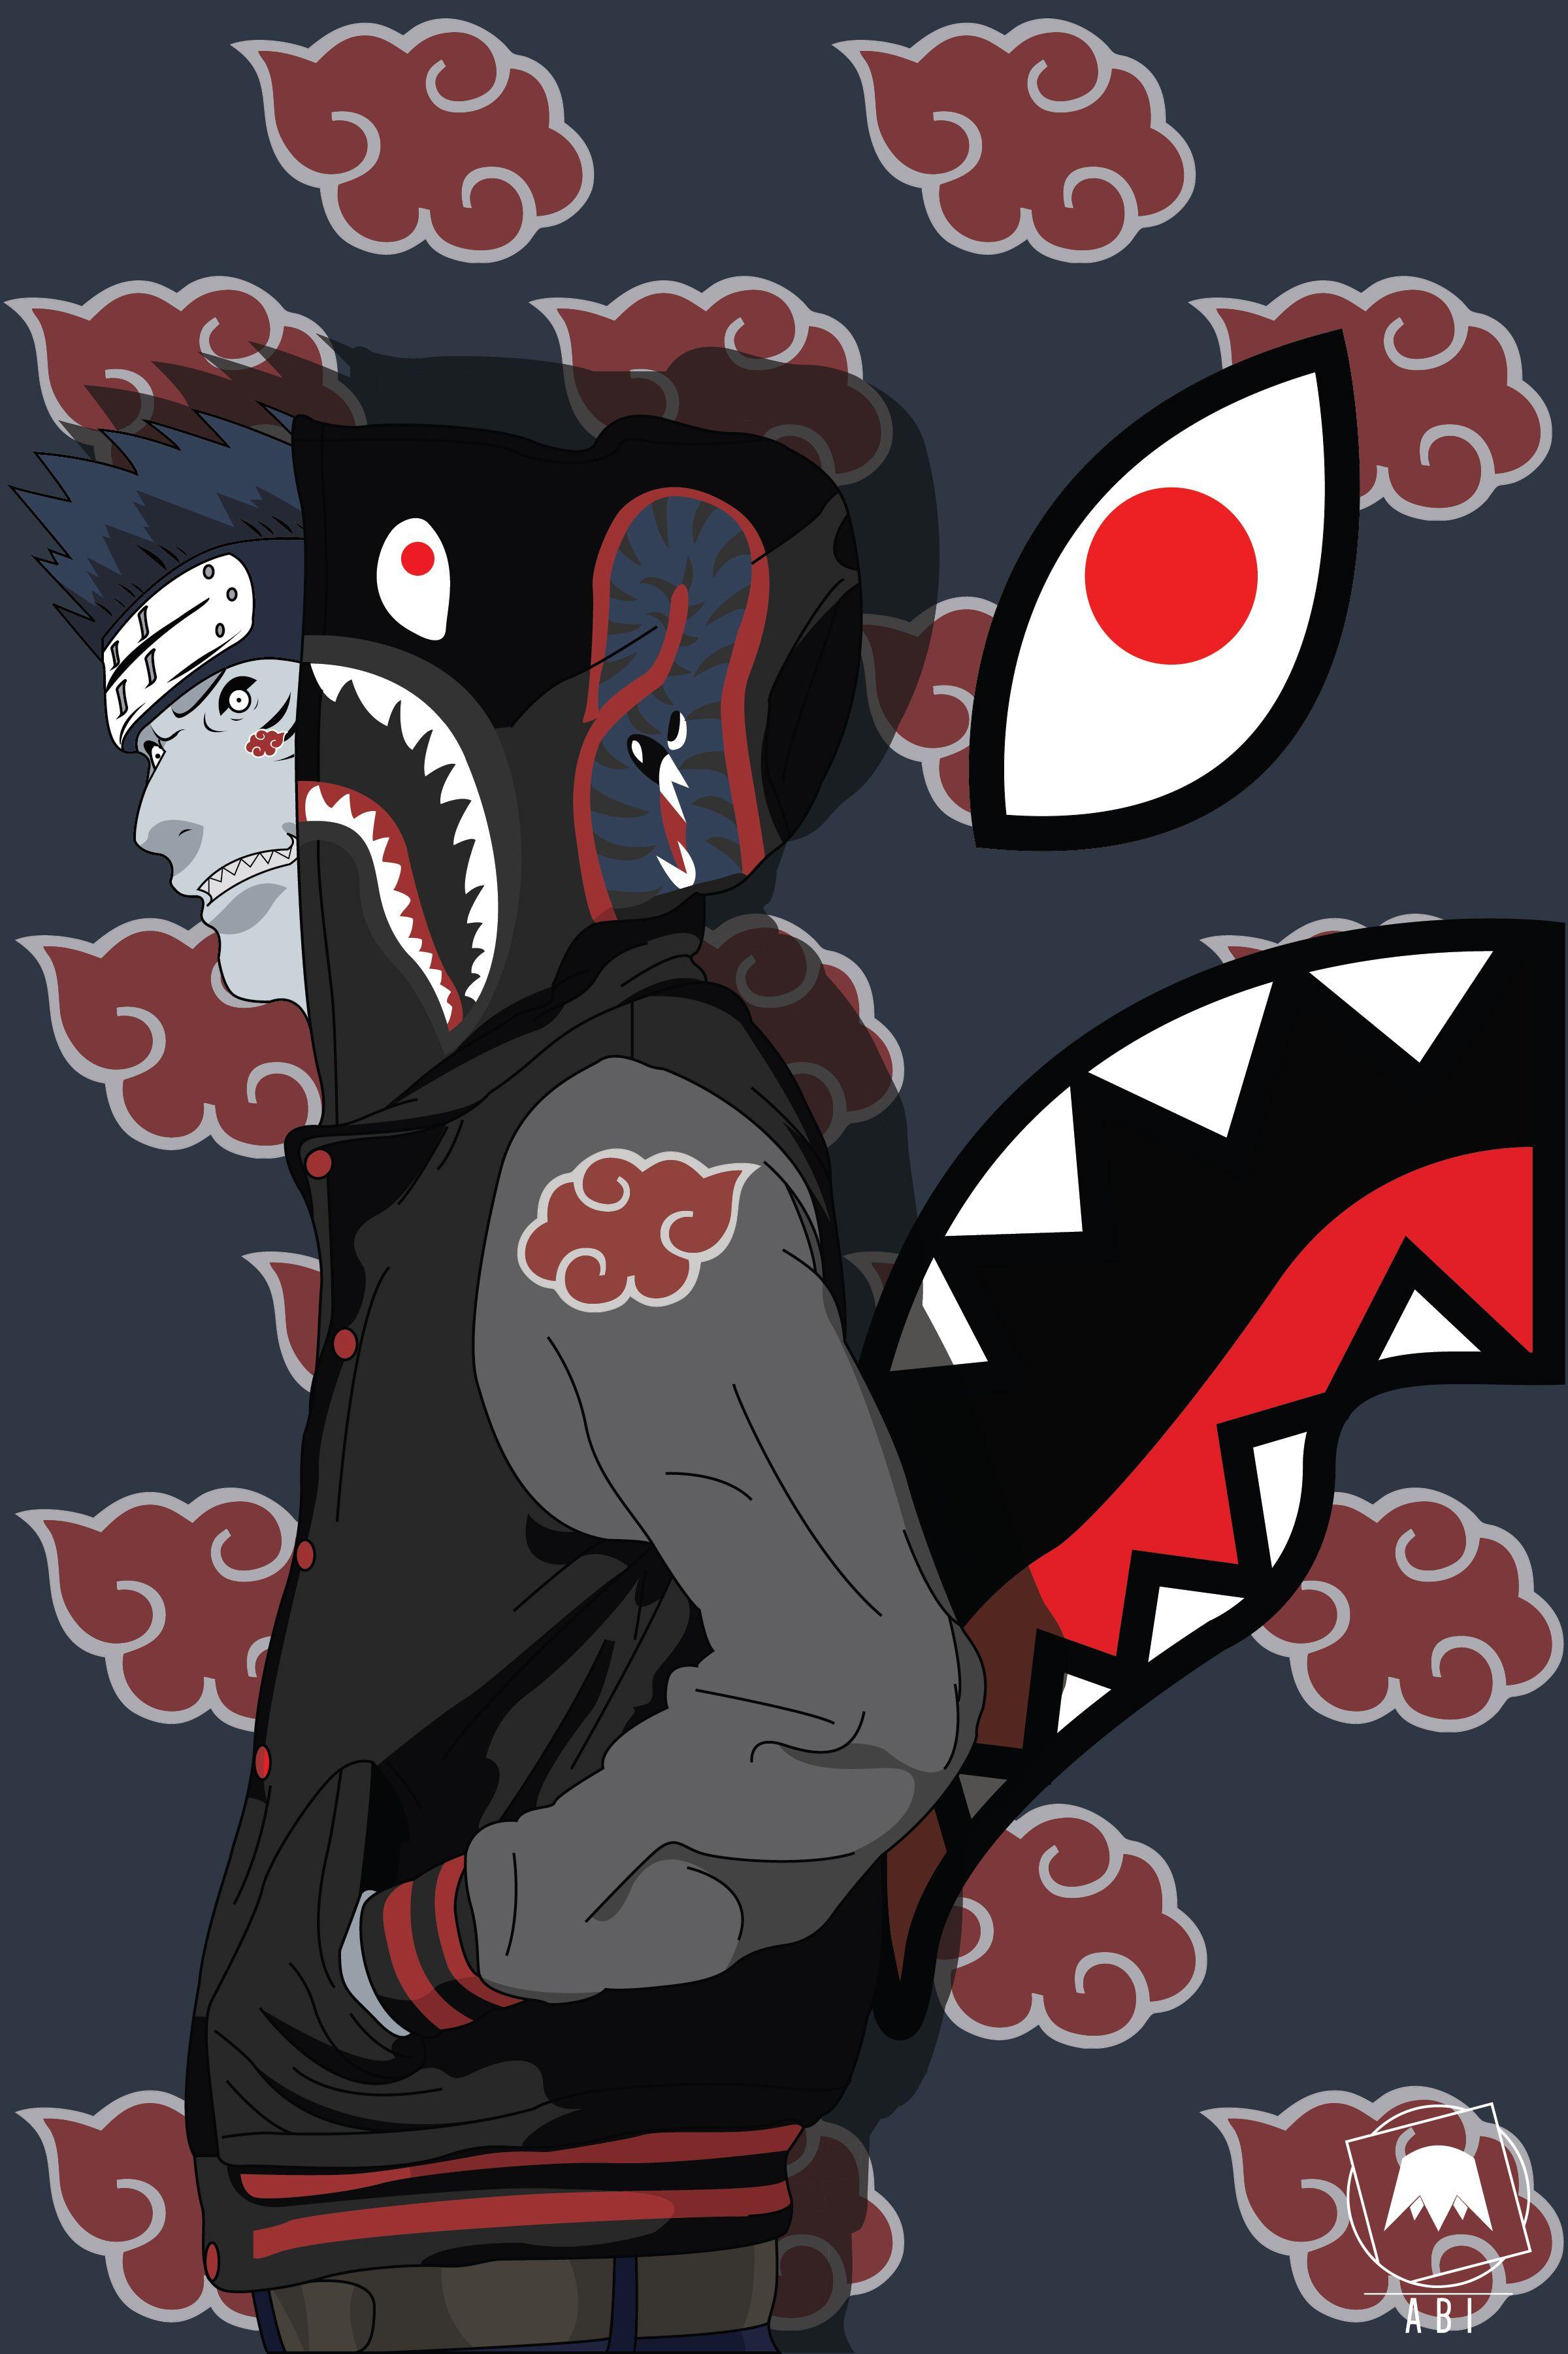 Stussy Hd Wallpaper Kasami Jpg 2400 215 3602 Bape Ninja Pinterest Bape